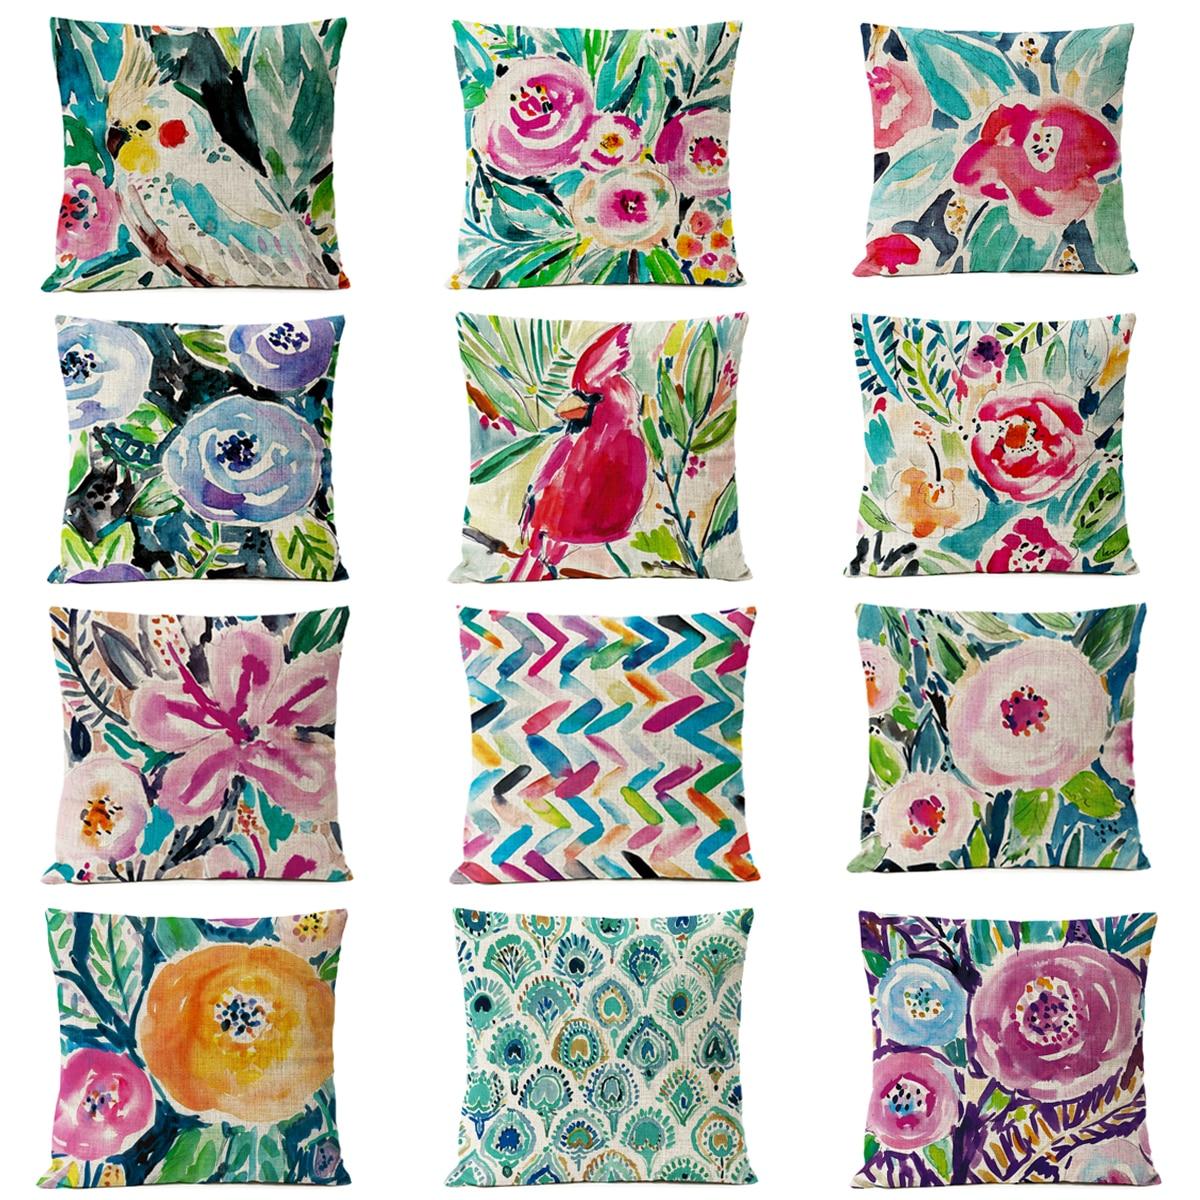 Home Decorative Throw Pillow Nordic Watercolor Floral Bird Pillow Cover Red Flower Cushion Cover sofa Linen Pillowcase